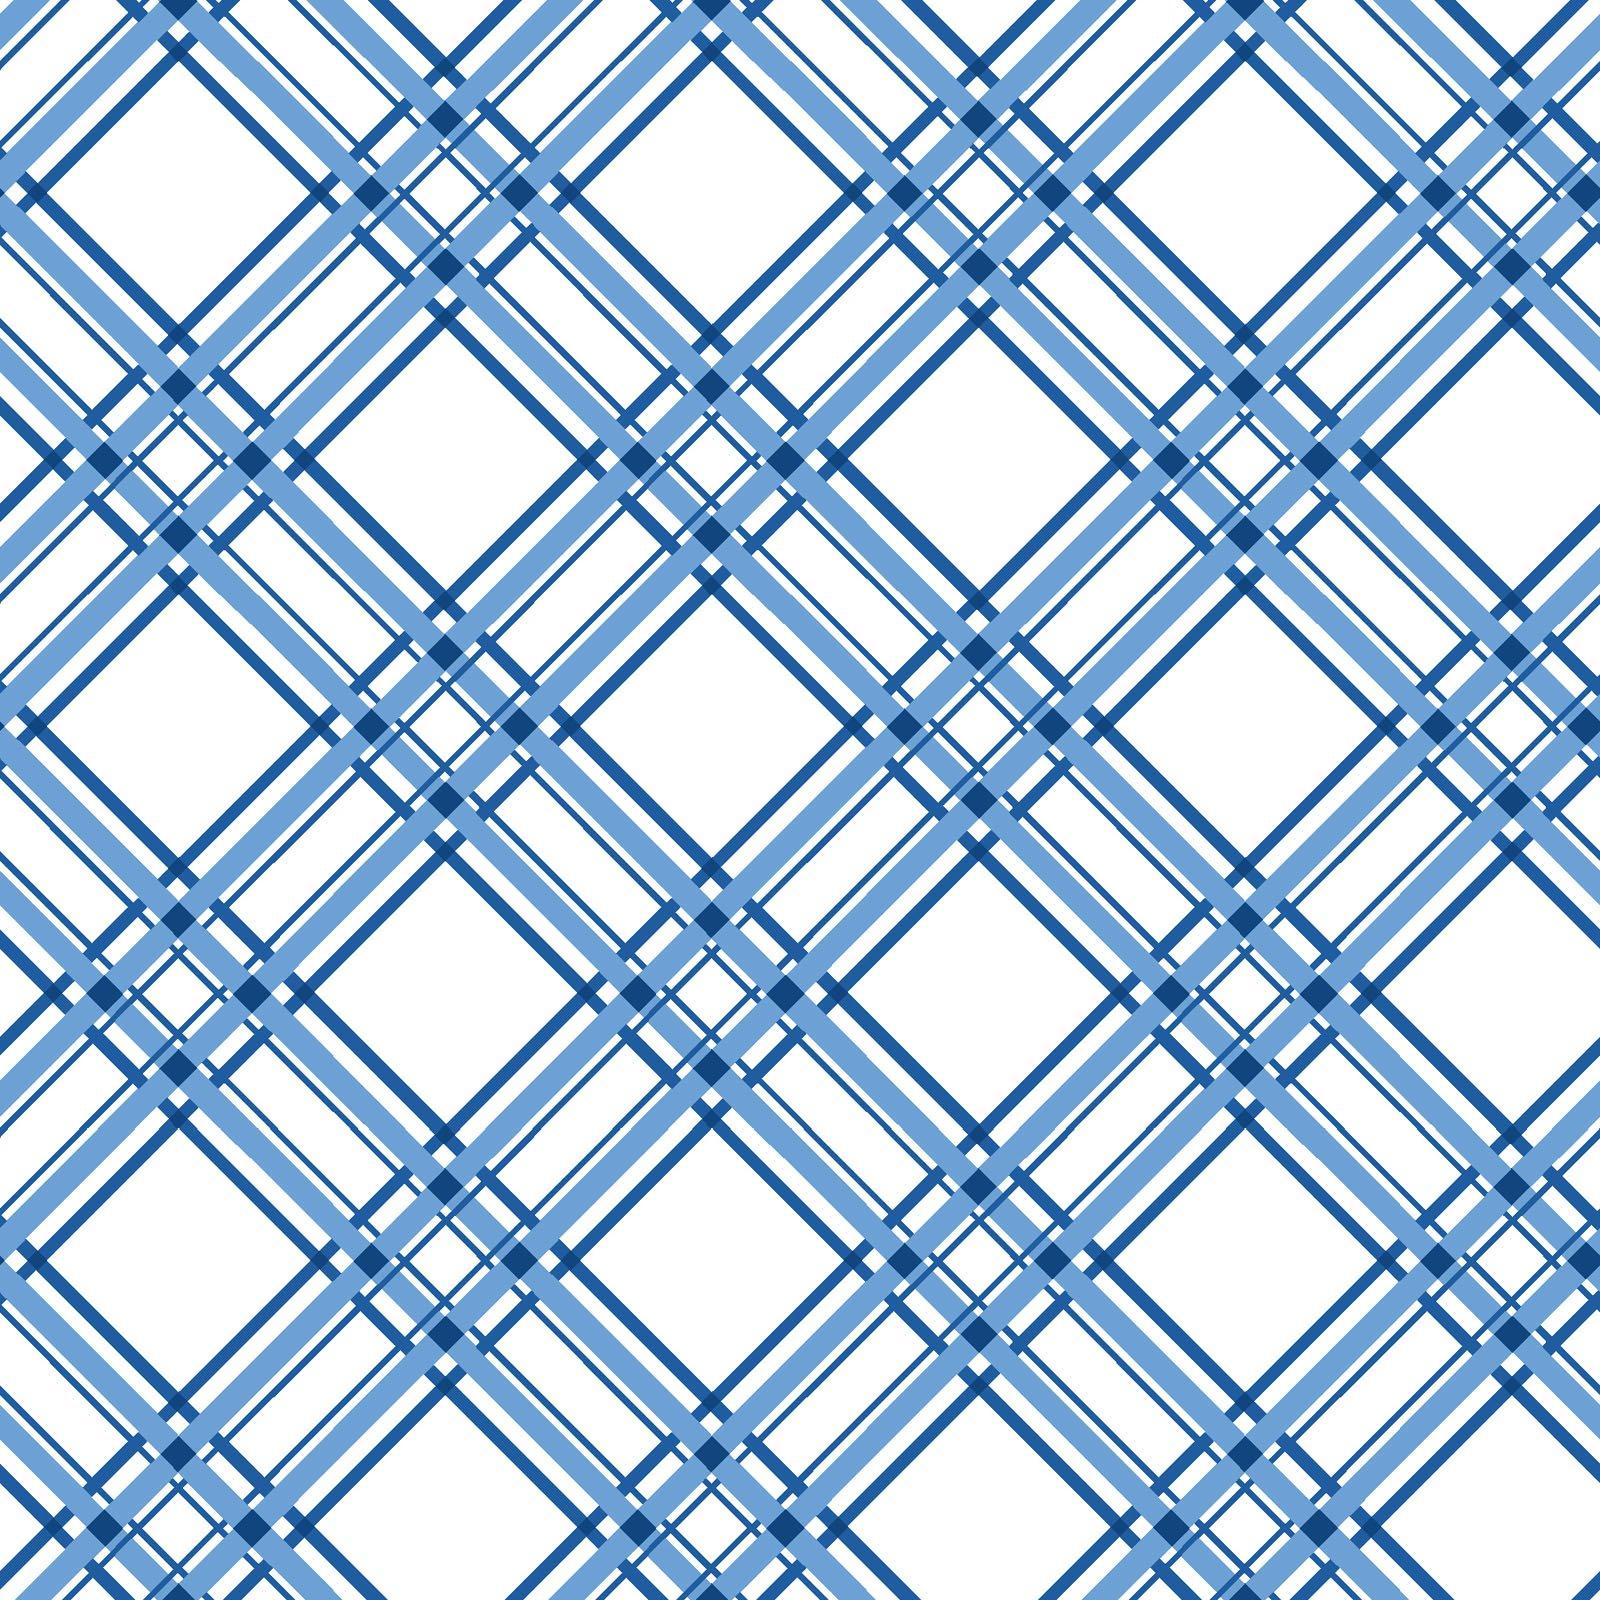 KimberBell Basics Blue Diagonal Plaid 8244M-B